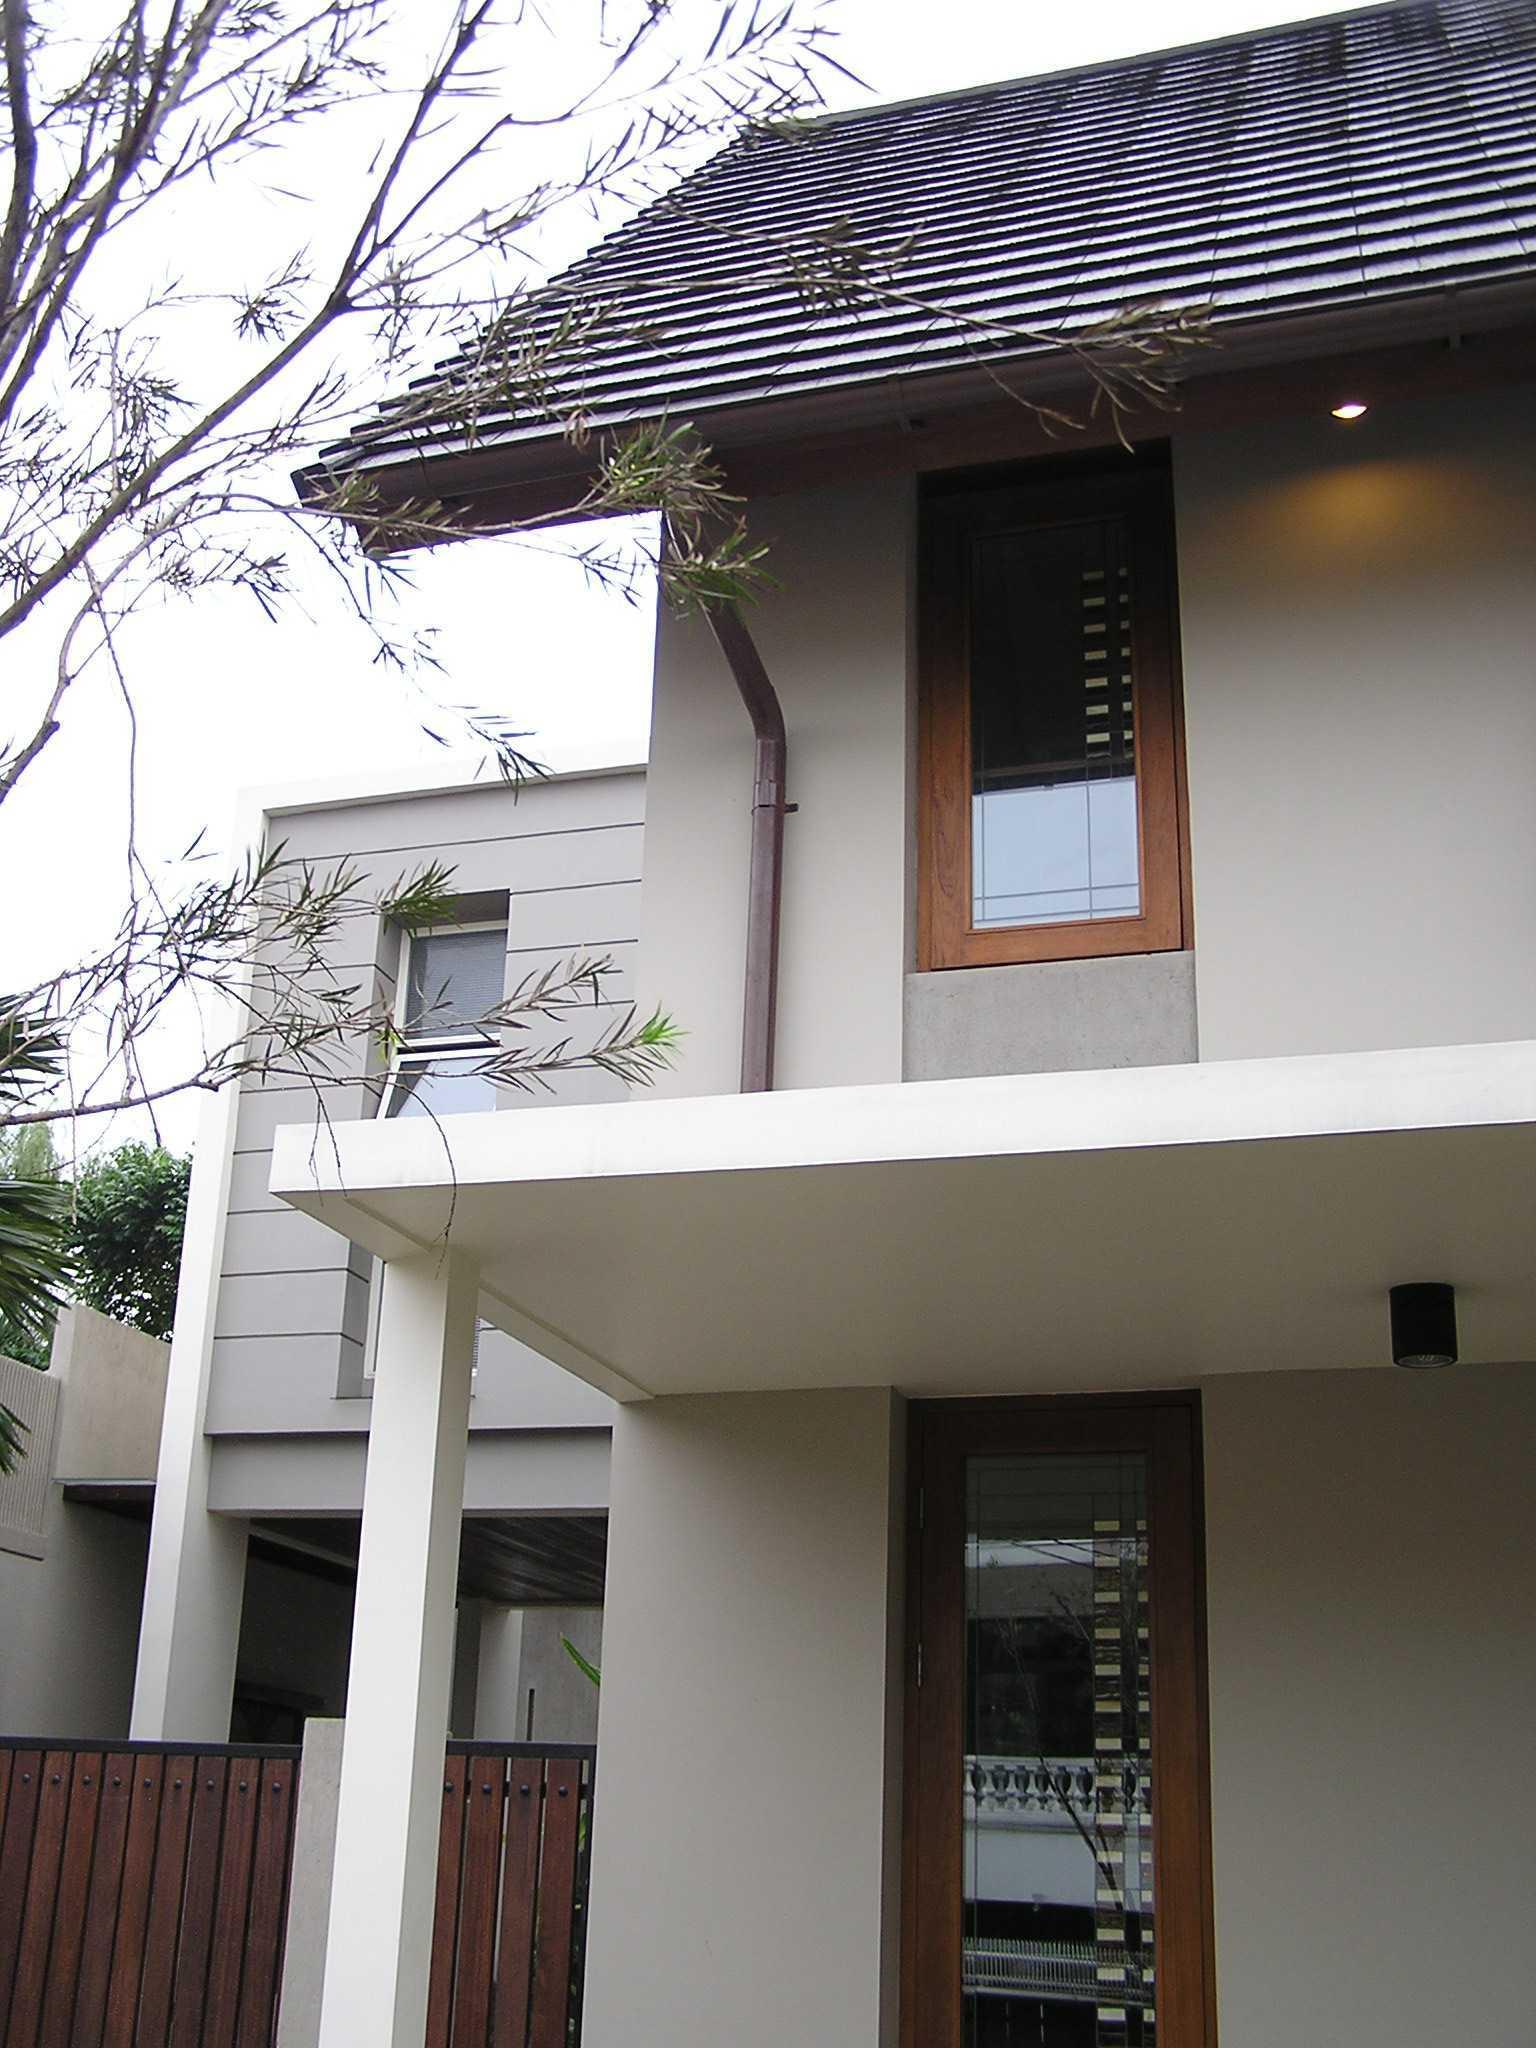 Pt. Garisprada Tomang Residence Tomang, Grogol Petamburan, West Jakarta City, Jakarta, Indonesia Tomang Exterior Kontemporer  22242